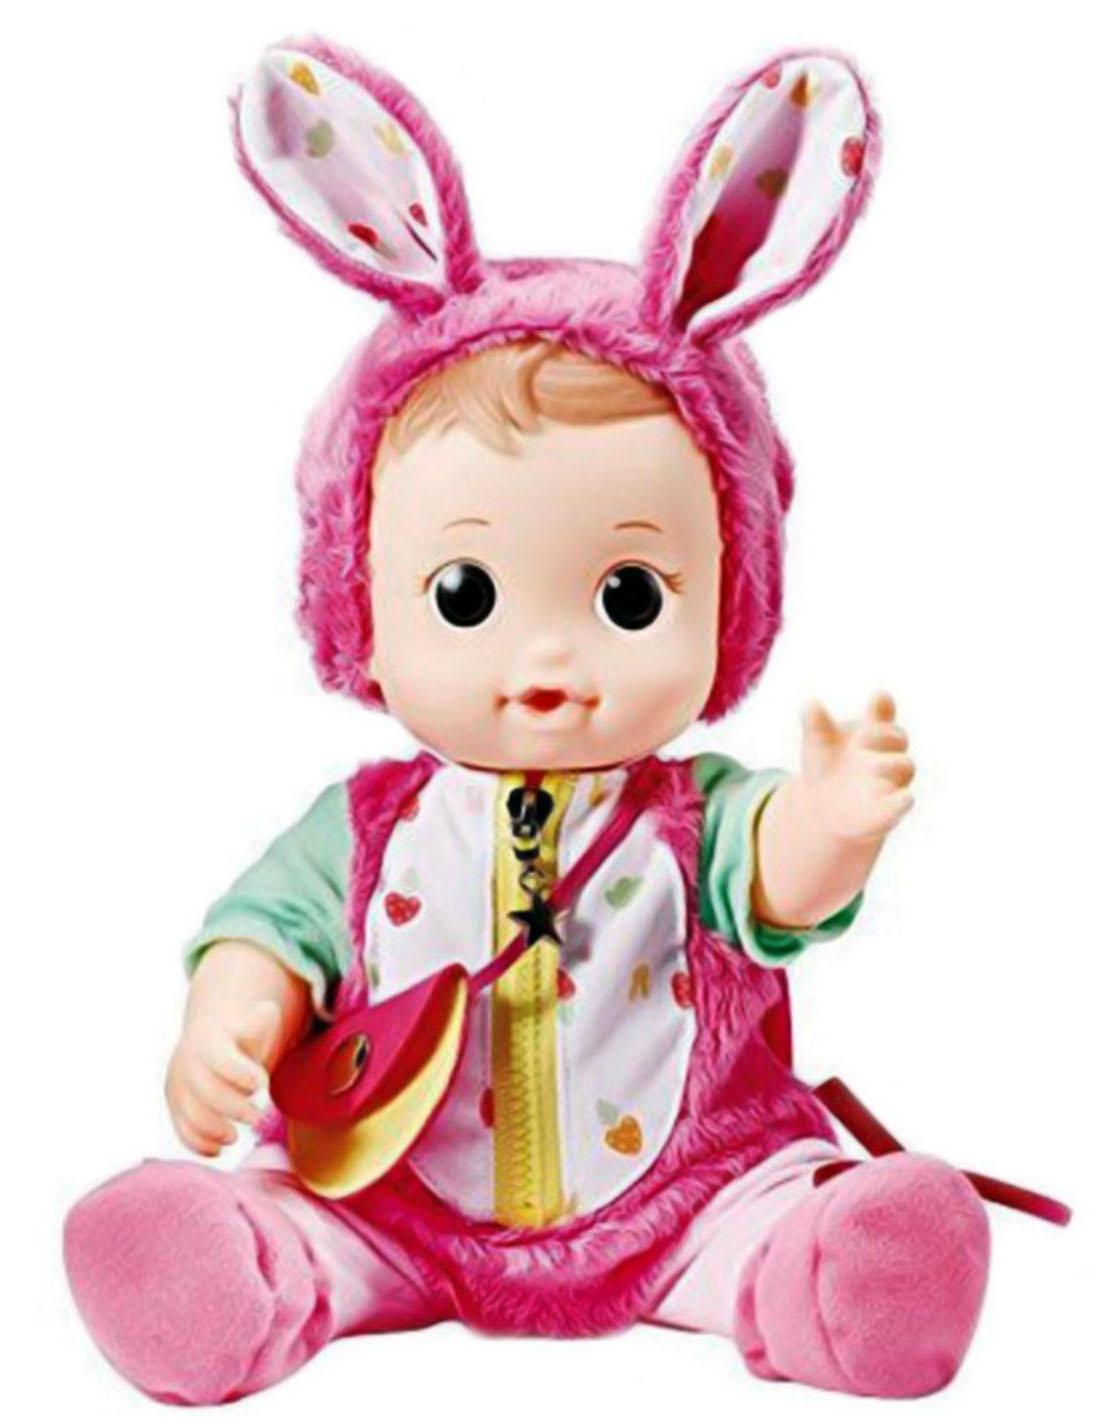 Другие куклы Консуни Уход за малышом: Малышка Хлоя с аксессуарами